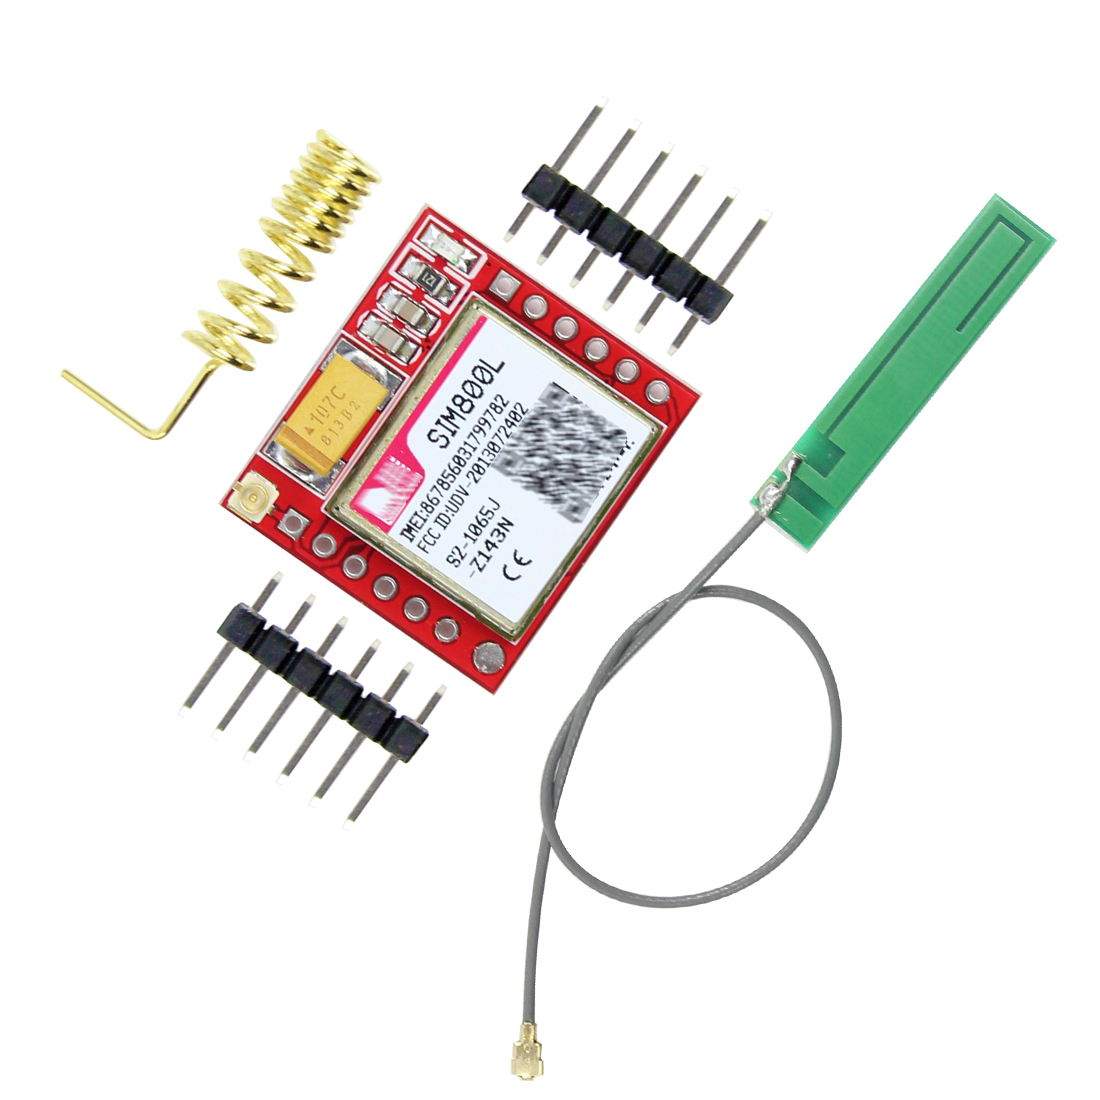 Smallest Mini SIM800L GPRS GSM Module MicroSIM Card Core Wireless Board Quad-band TTL Serial Port With IPX Antenna For Arduino